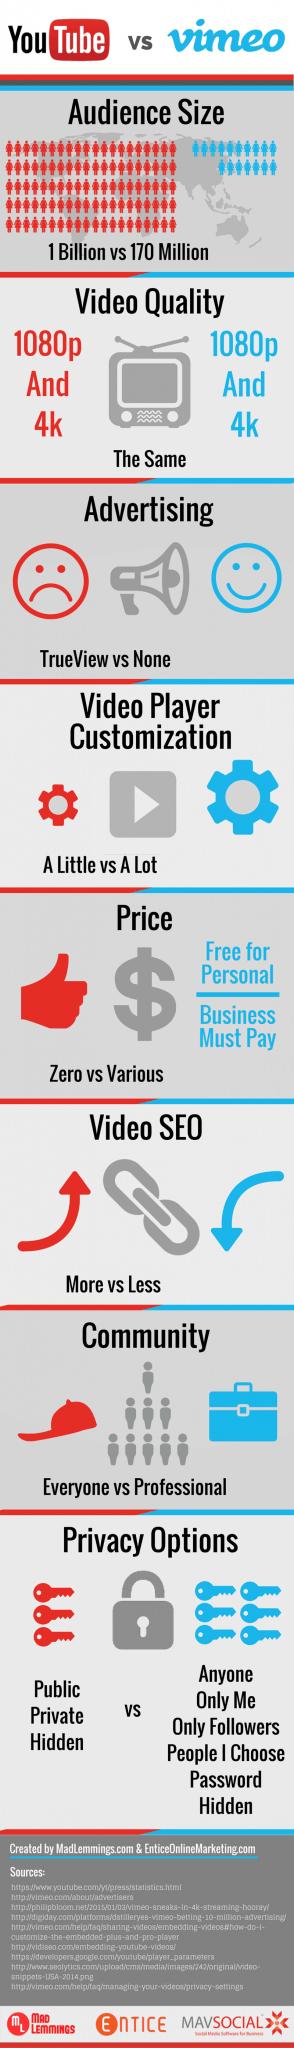 Vimeo vs YouTube online video platforms